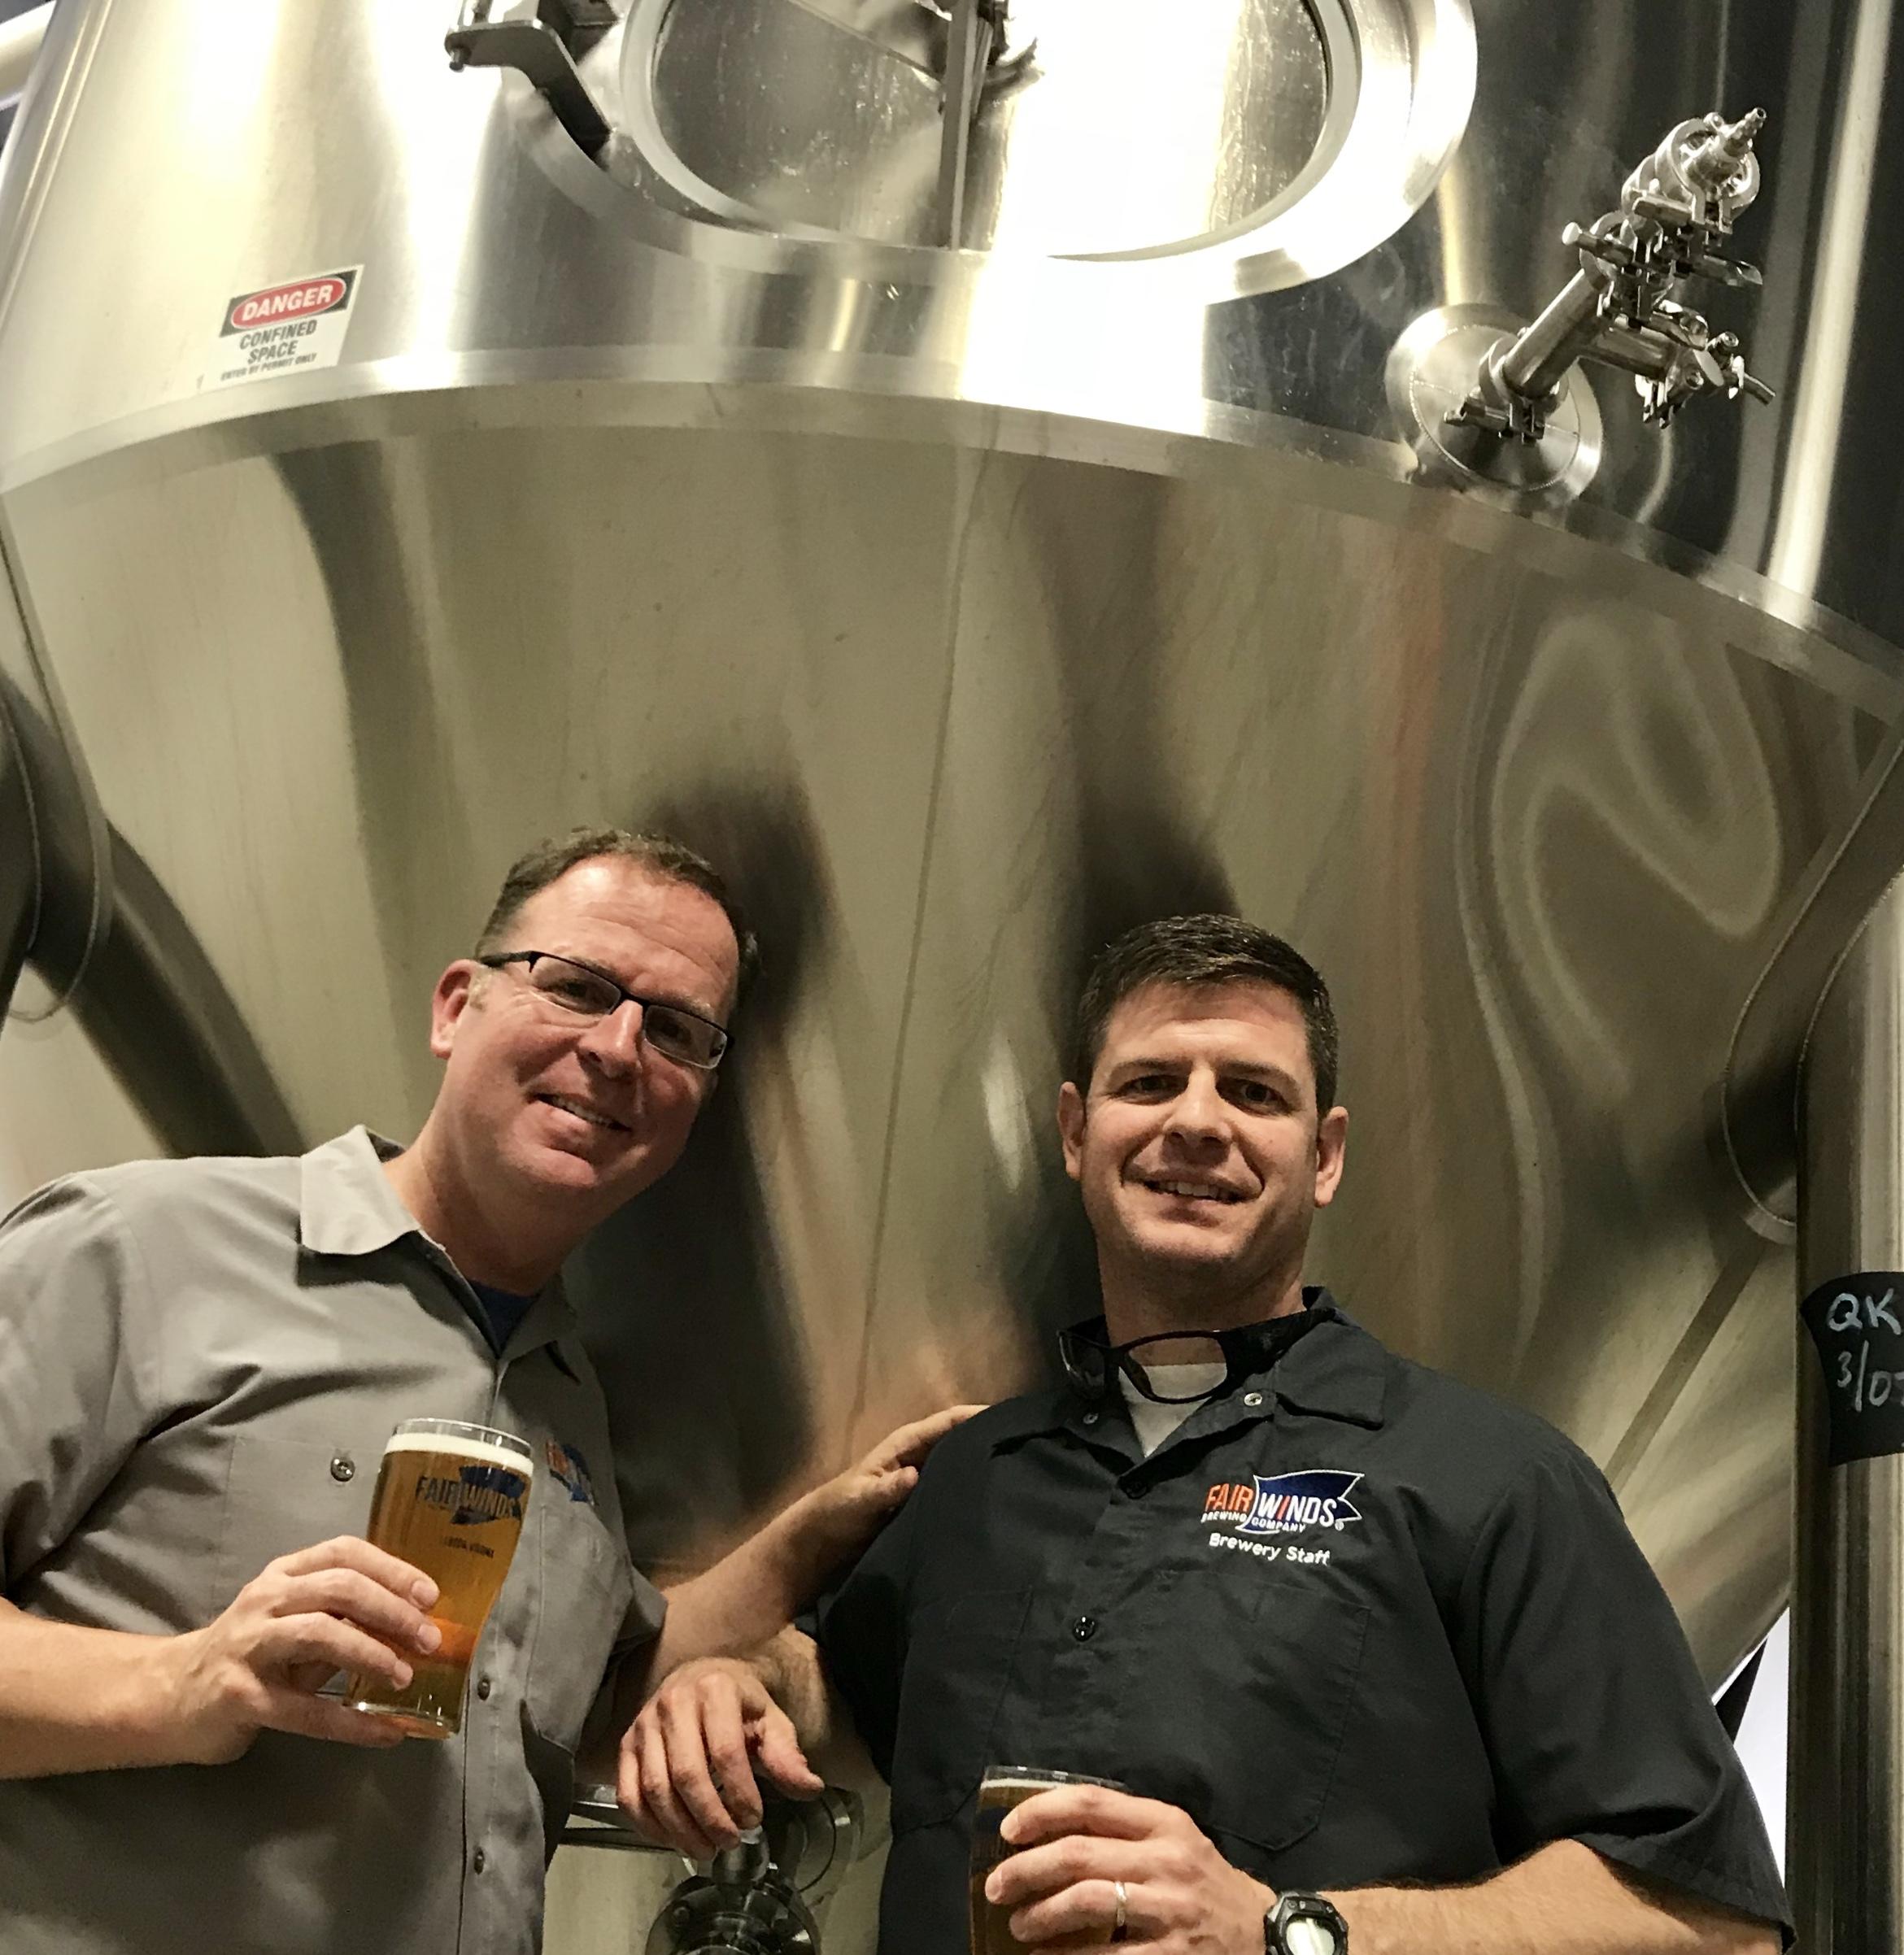 Sailor turned Beer Man